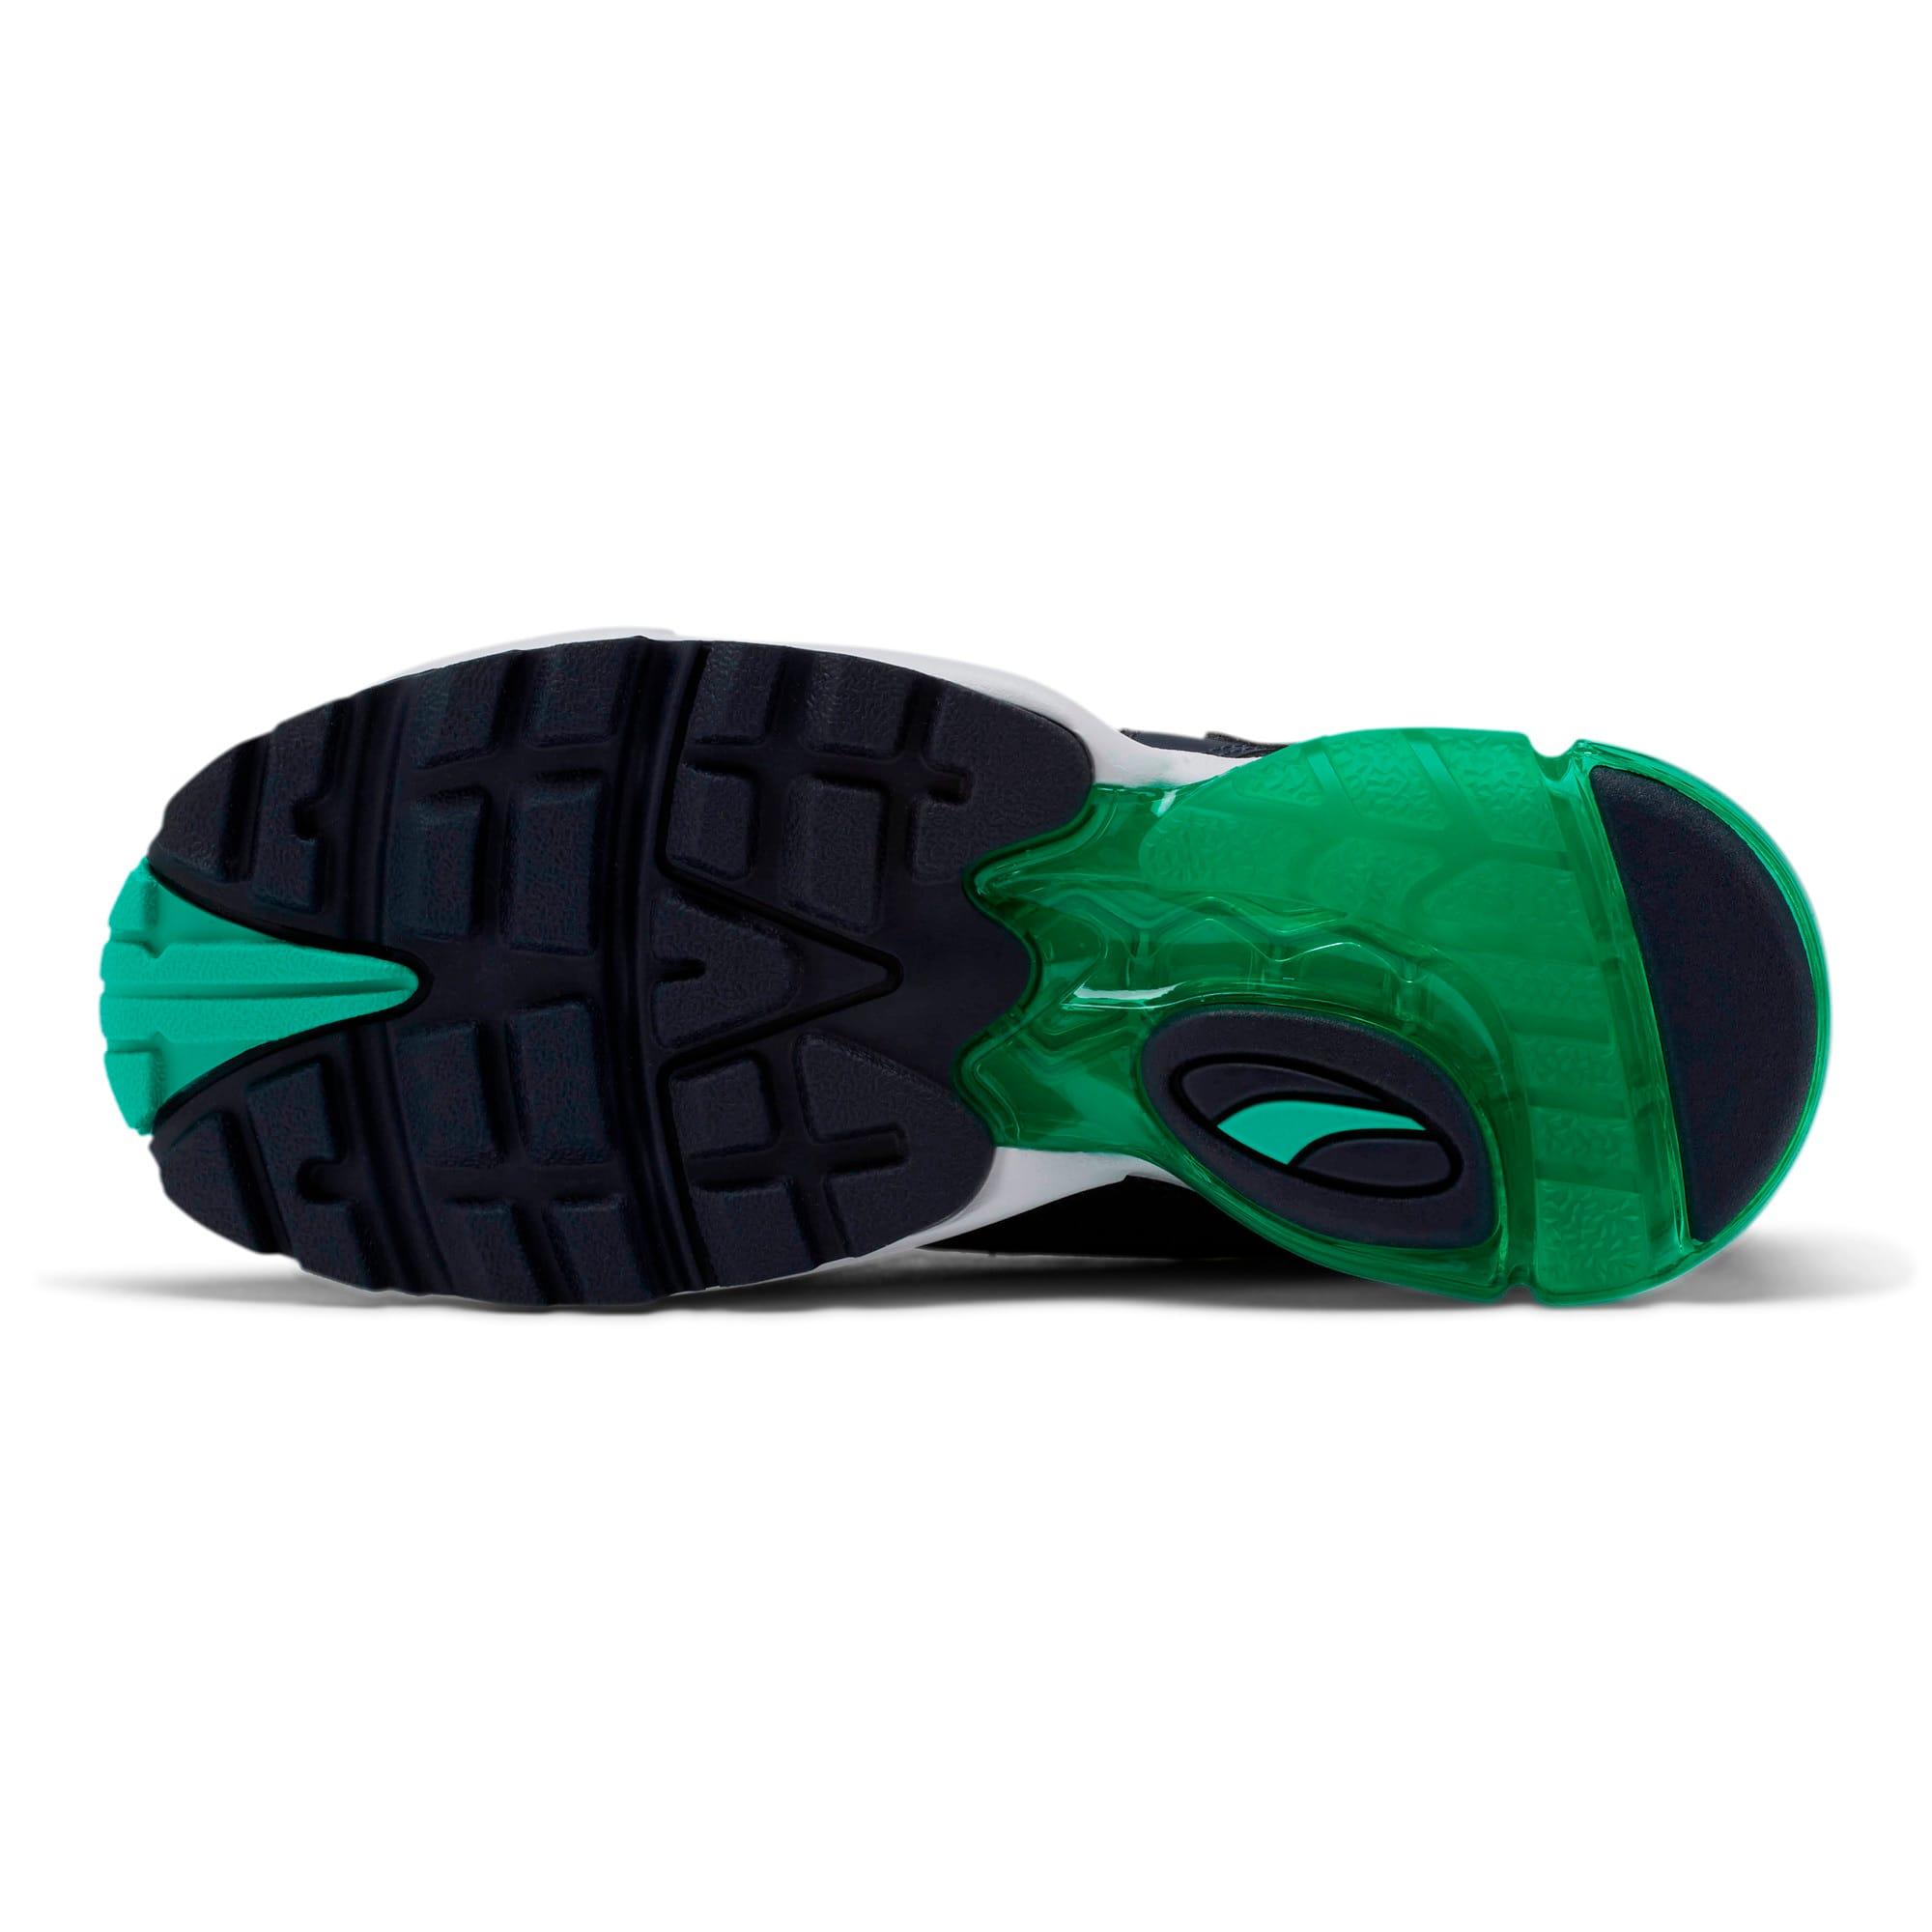 Thumbnail 4 of CELL Alien 51 Sneakers JR, Peacoat-Biscay Green, medium